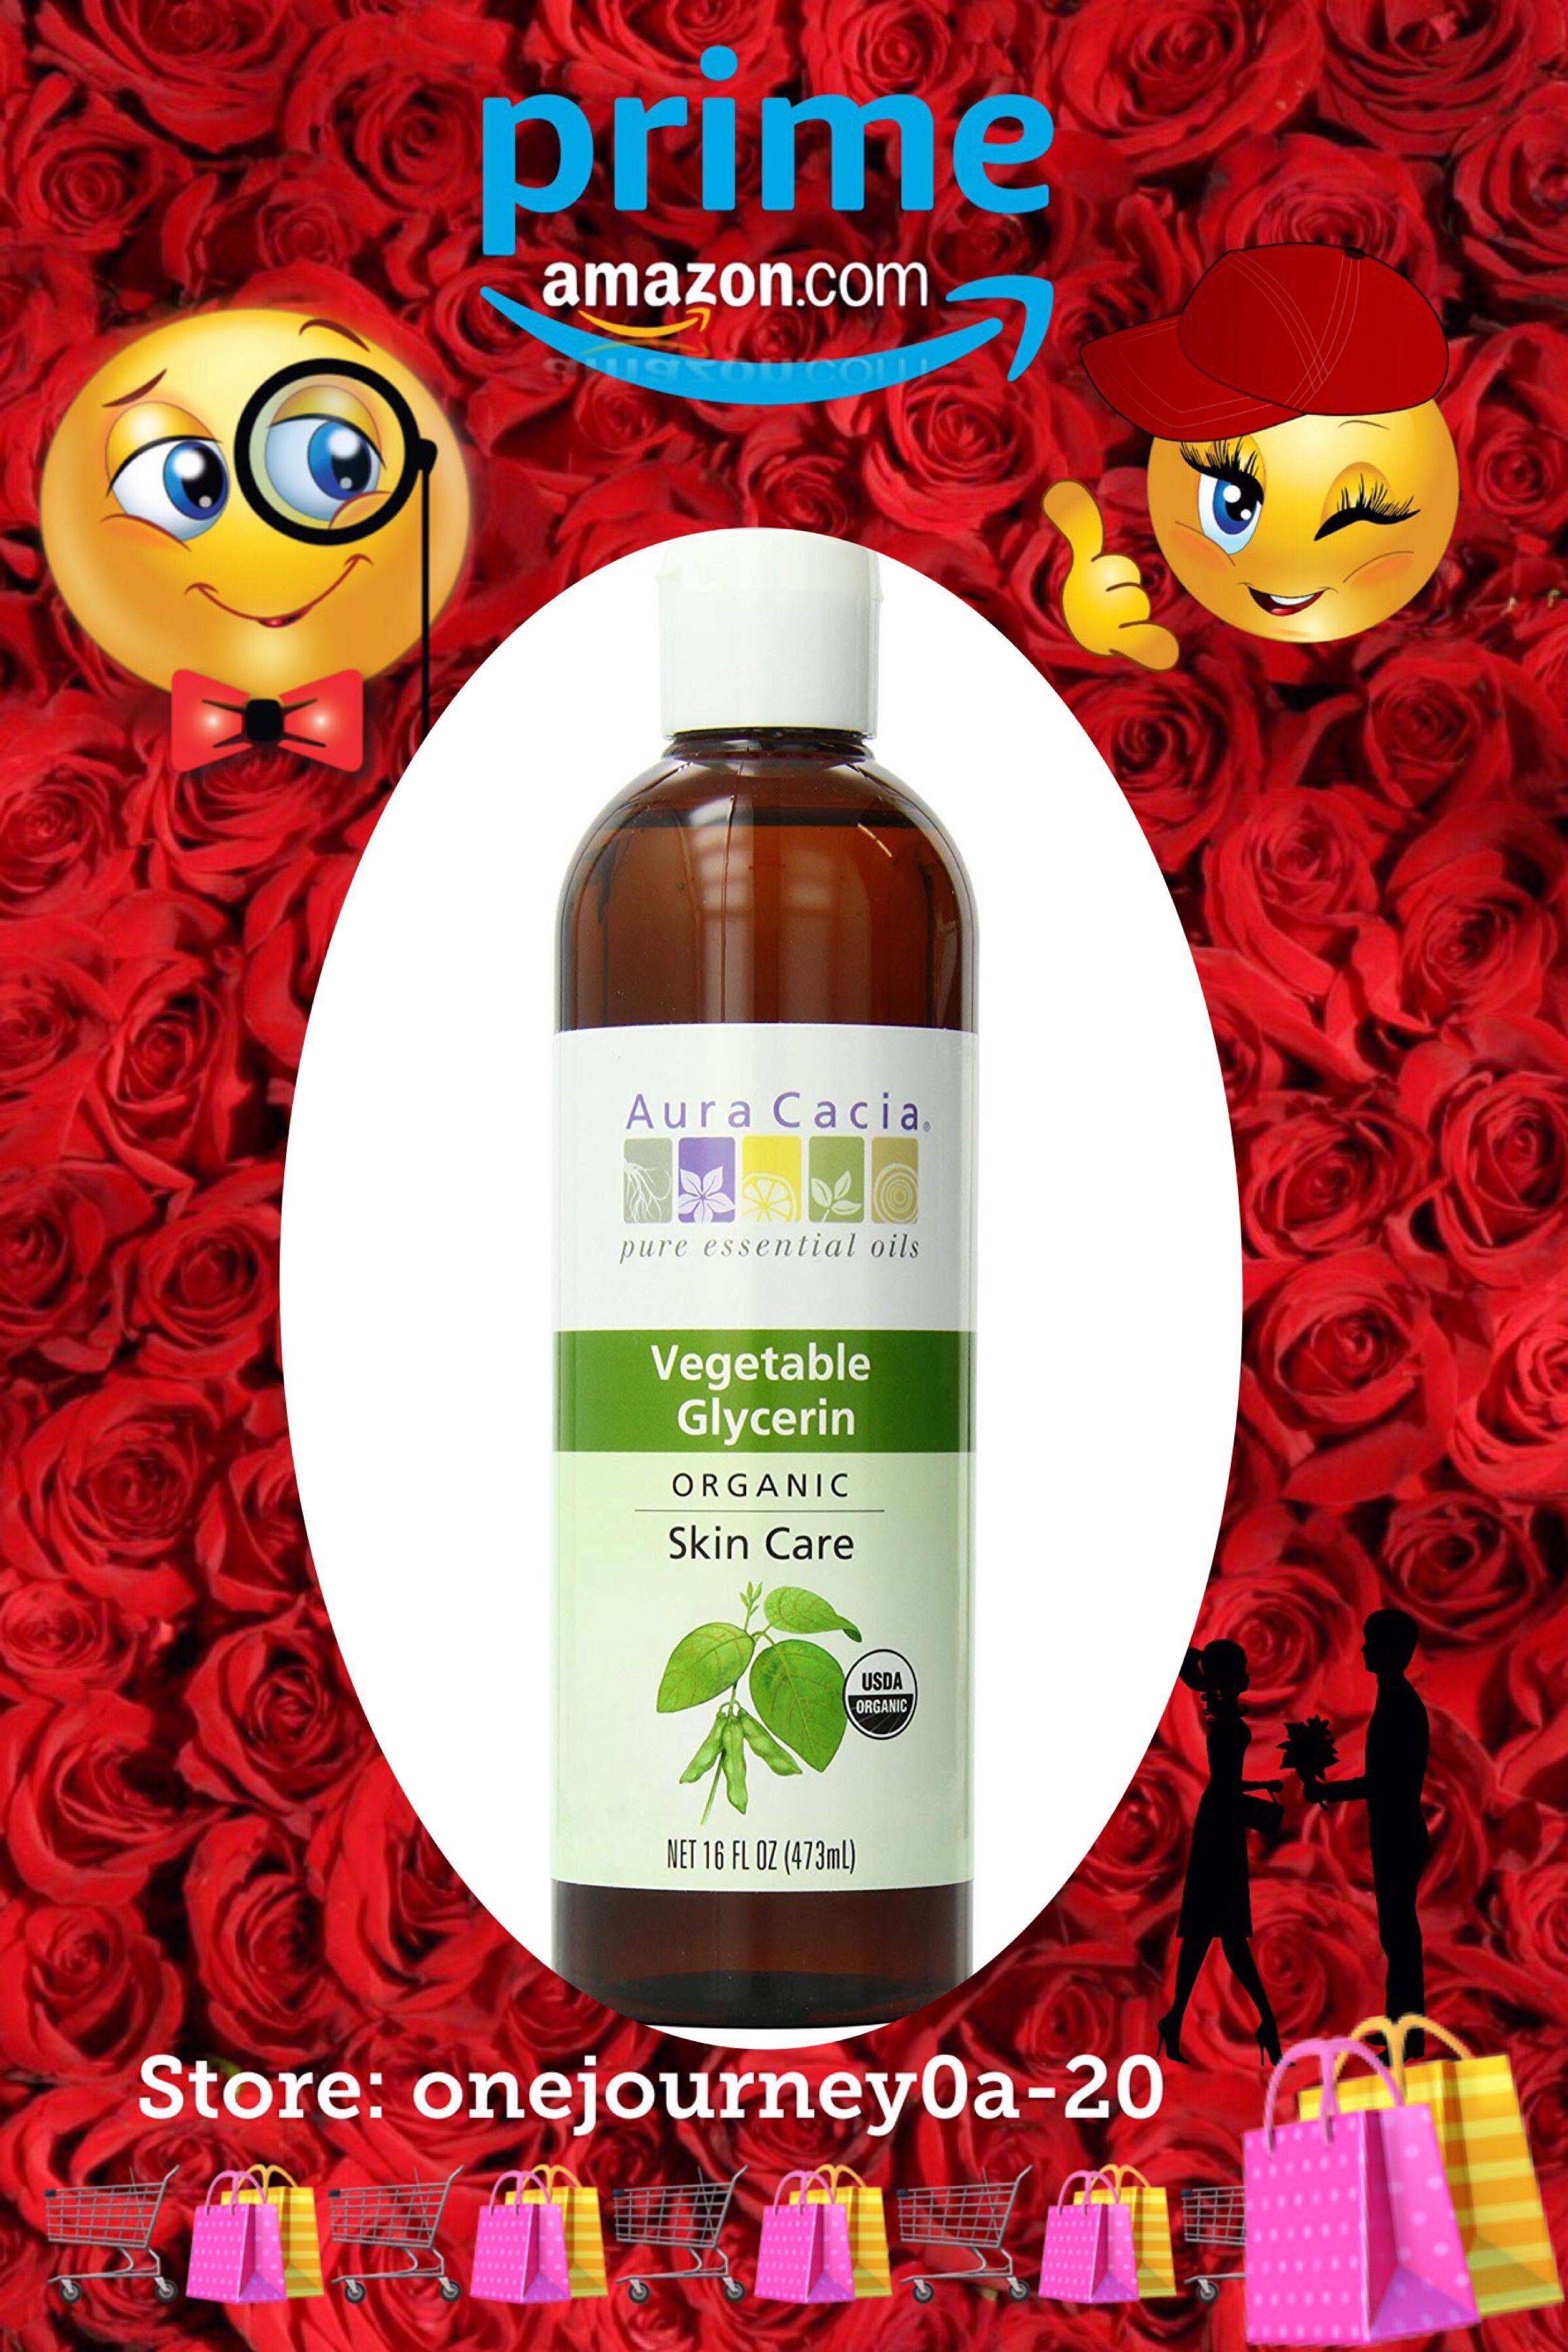 Aura Cacia Skin Care Oil Organic Vegetable Glycerin Oil Oil Skin Care Organic Skin Care Oils Pure Skin Care